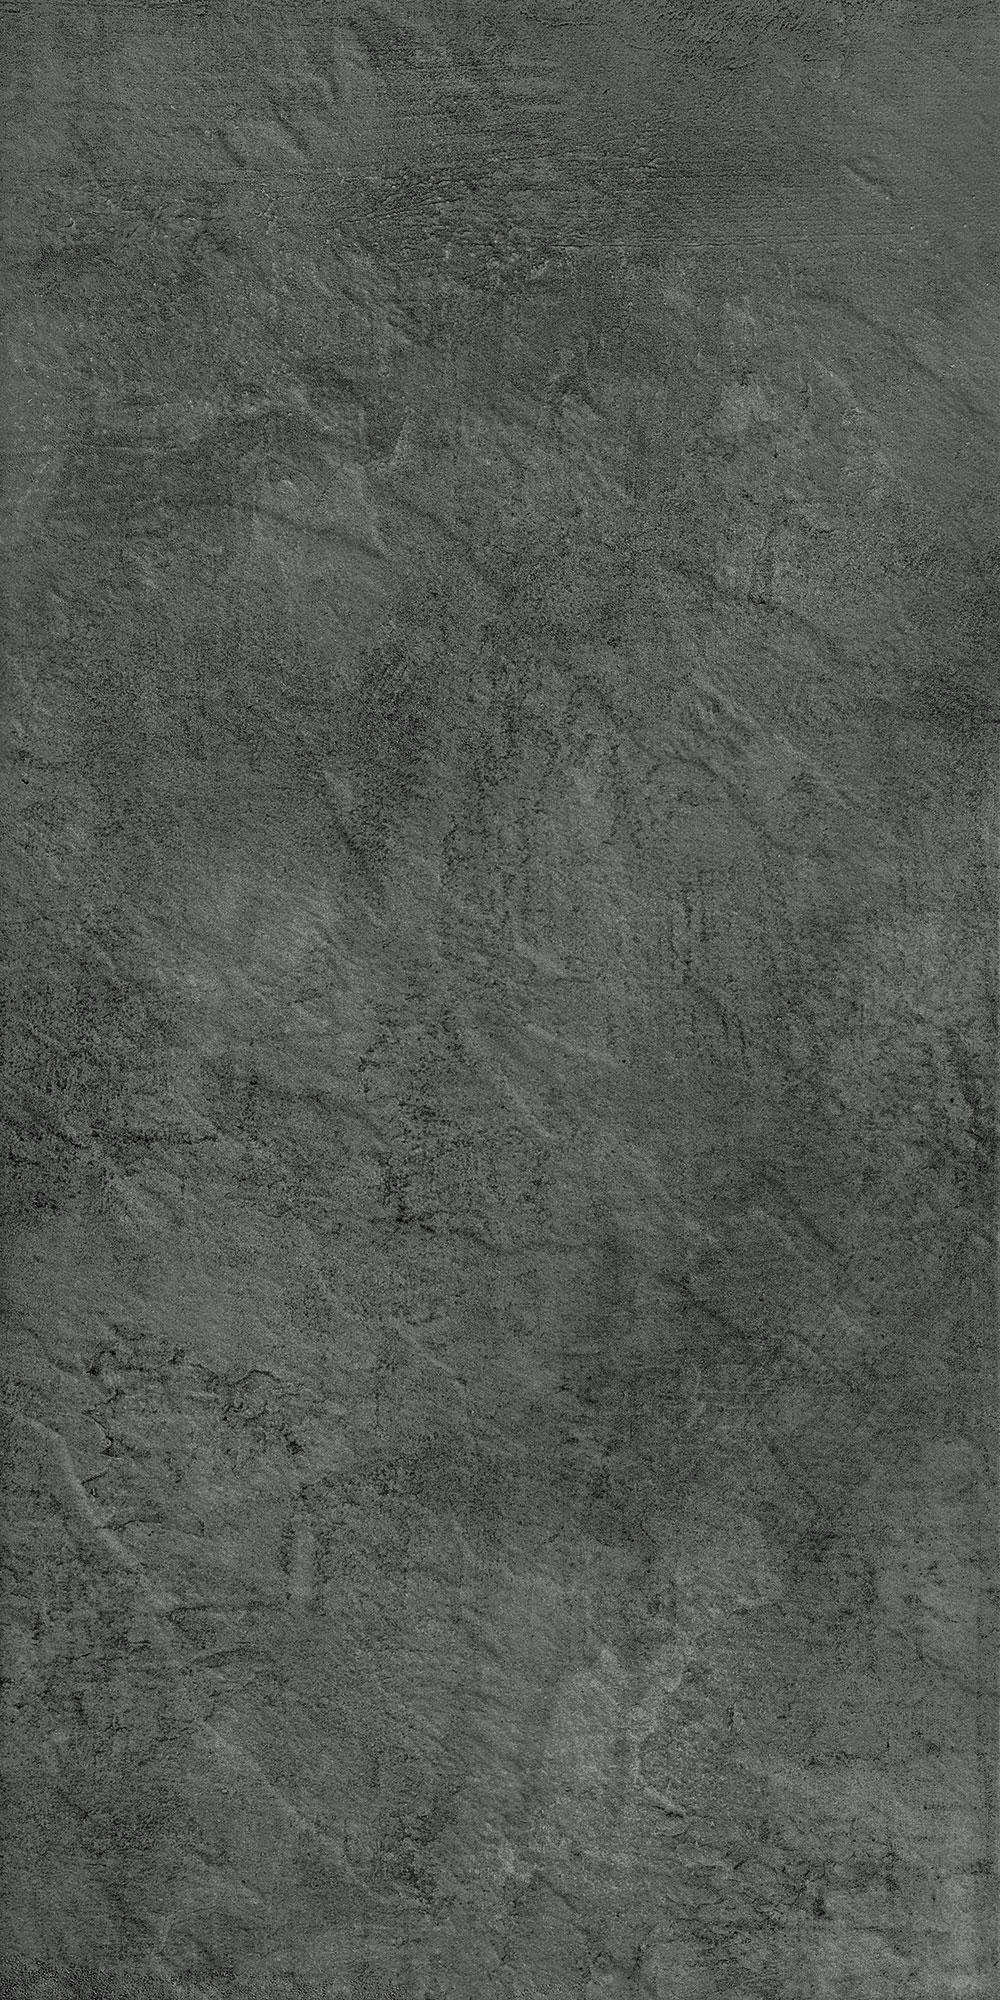 Perle Noir Slate Effect Tiles